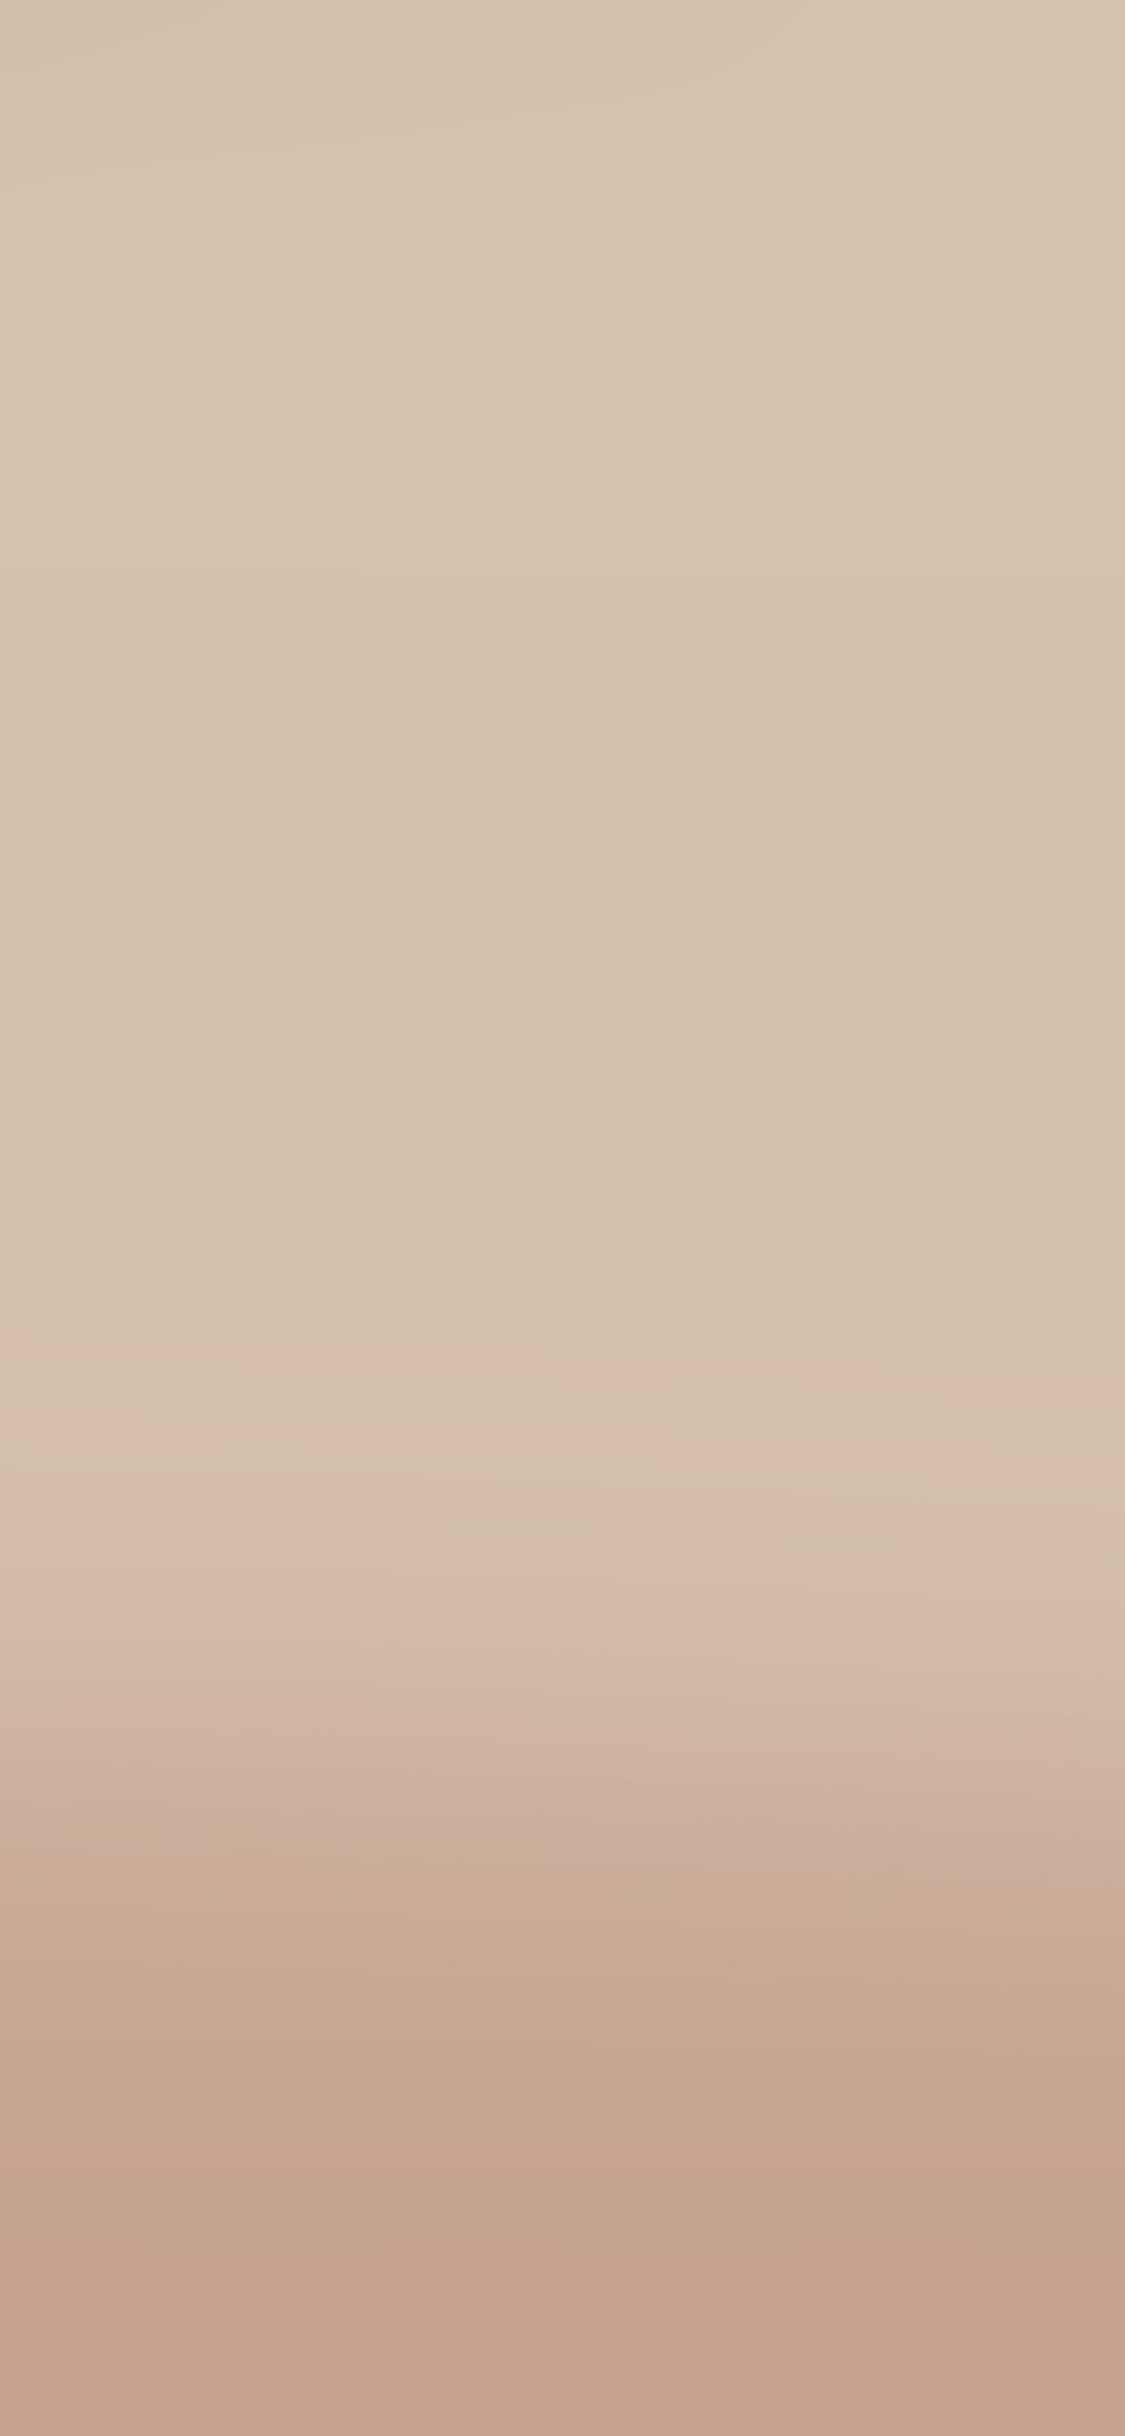 iPhoneXpapers.com-Apple-iPhone-wallpaper-sb06-wallpaper-pastel-music-blur